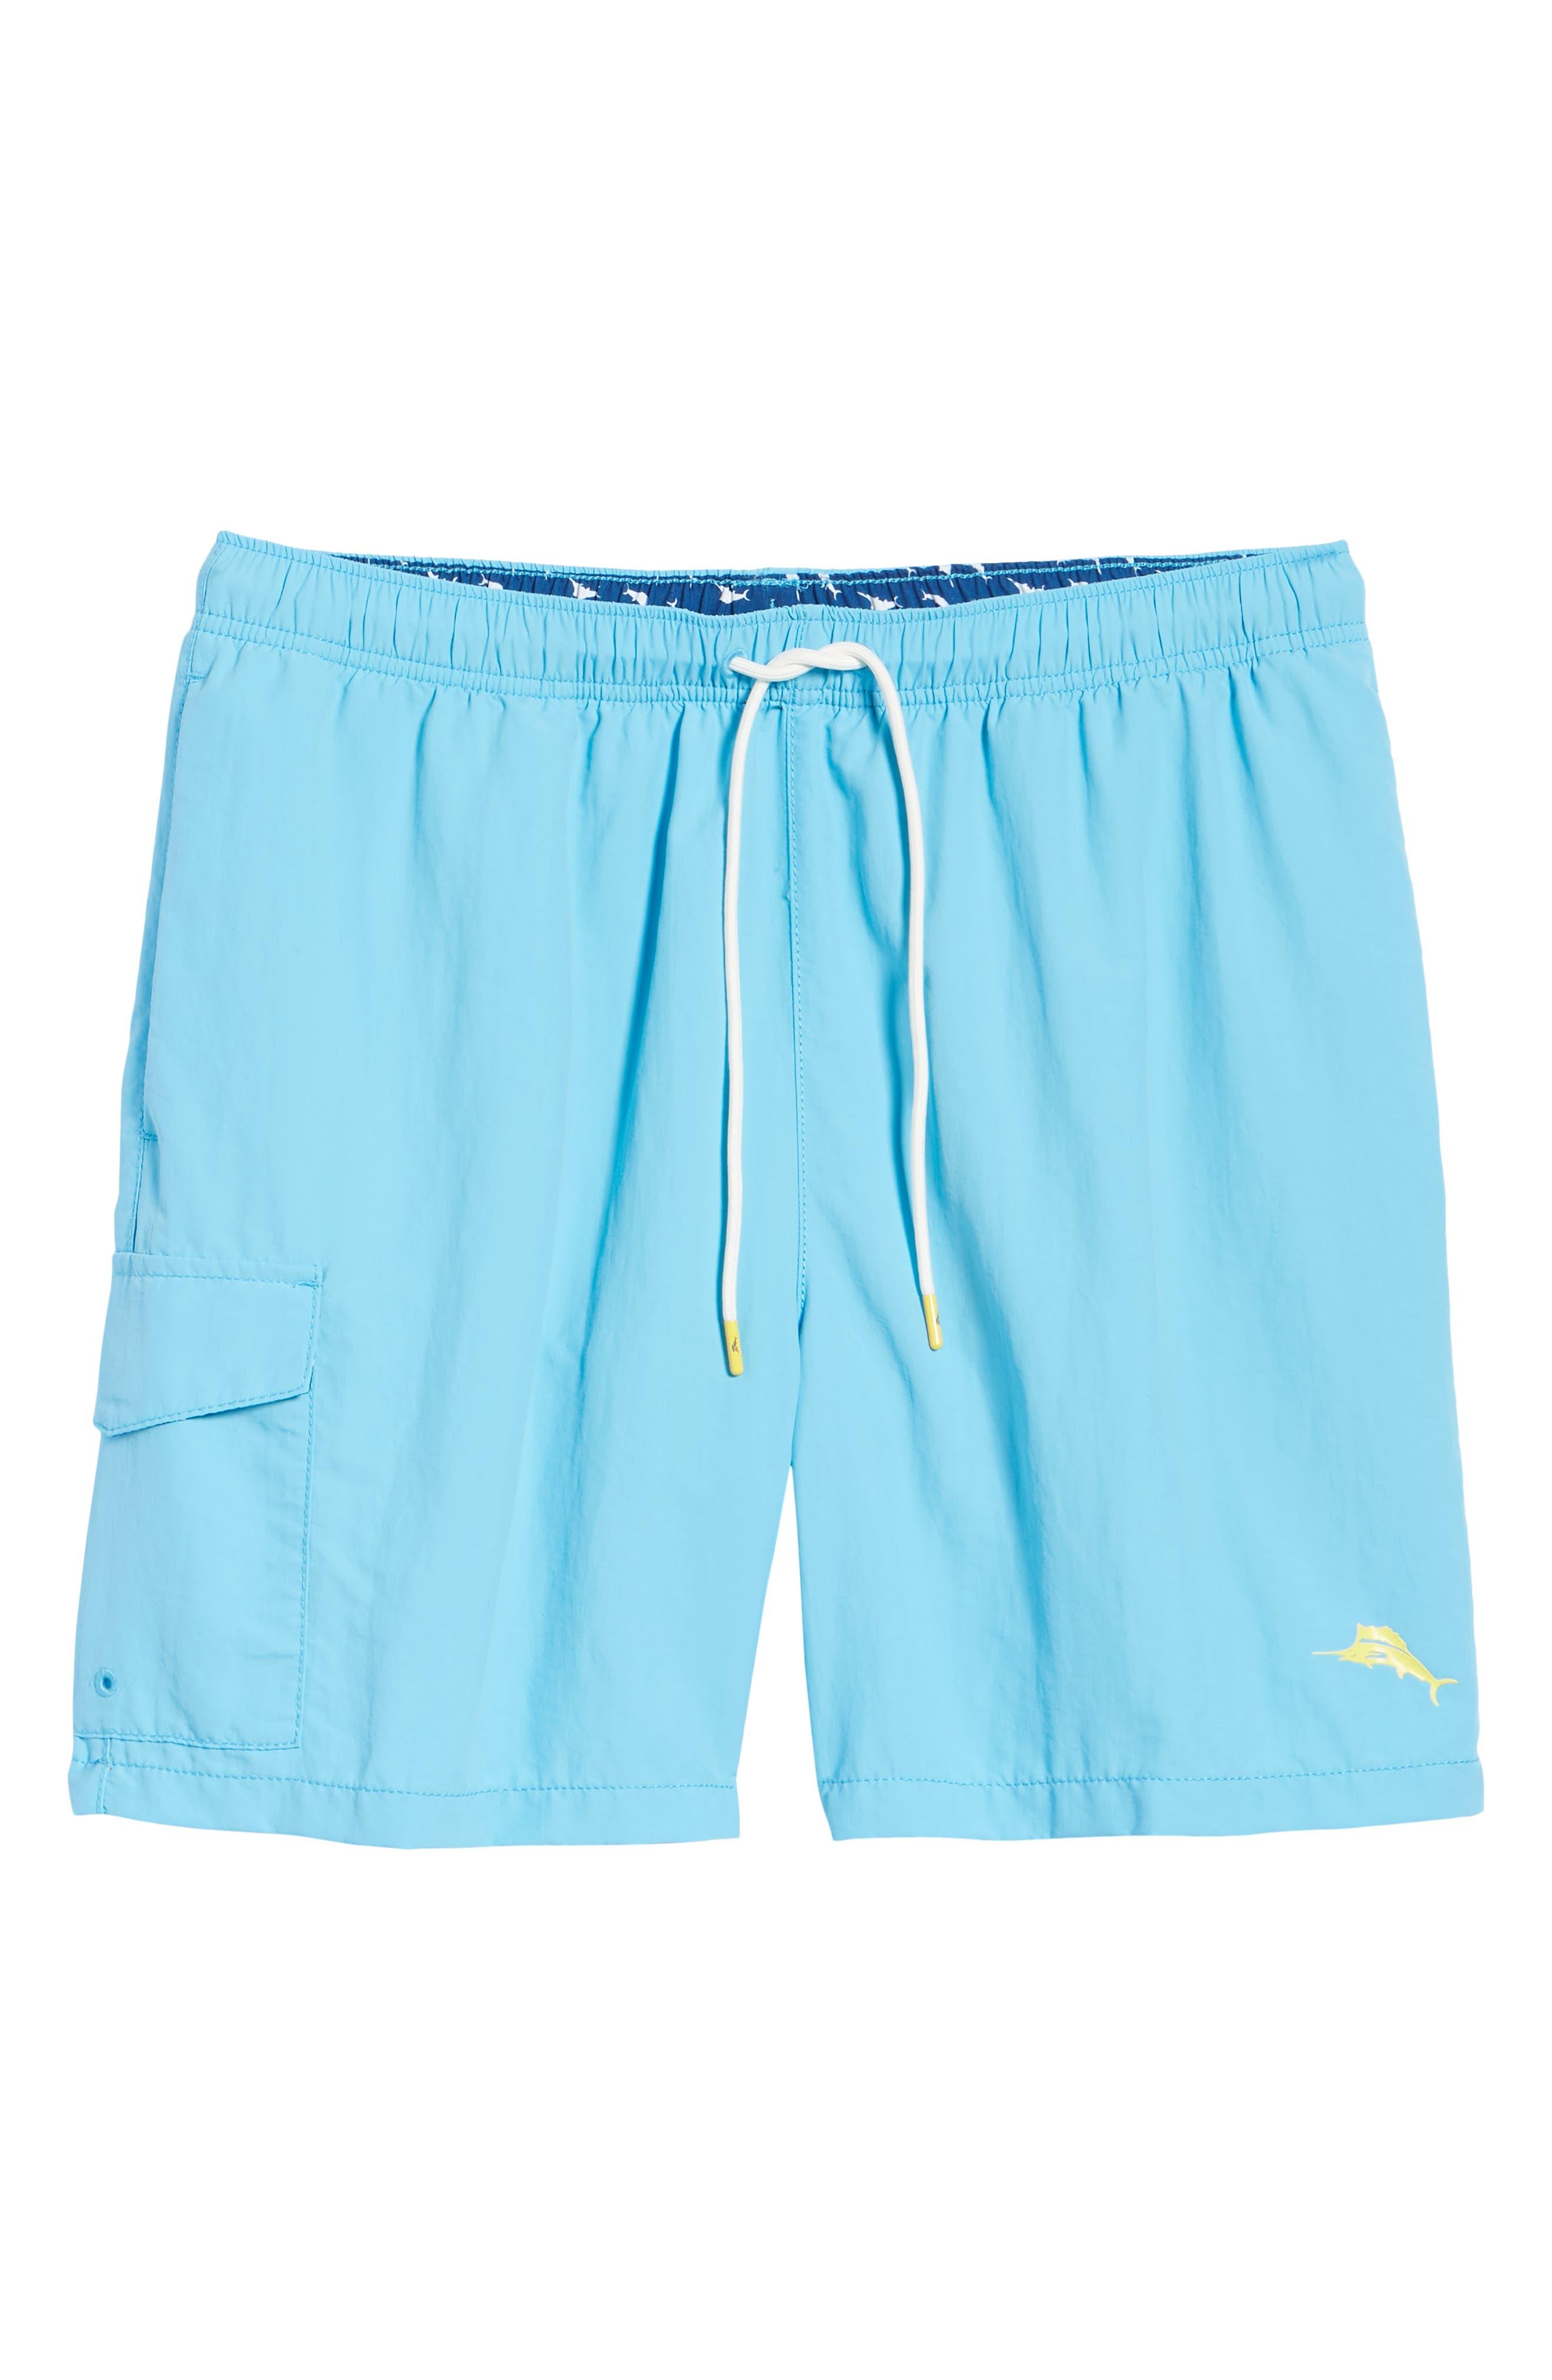 Naples Coast Swim Trunks,                             Alternate thumbnail 6, color,                             Breeze Blue